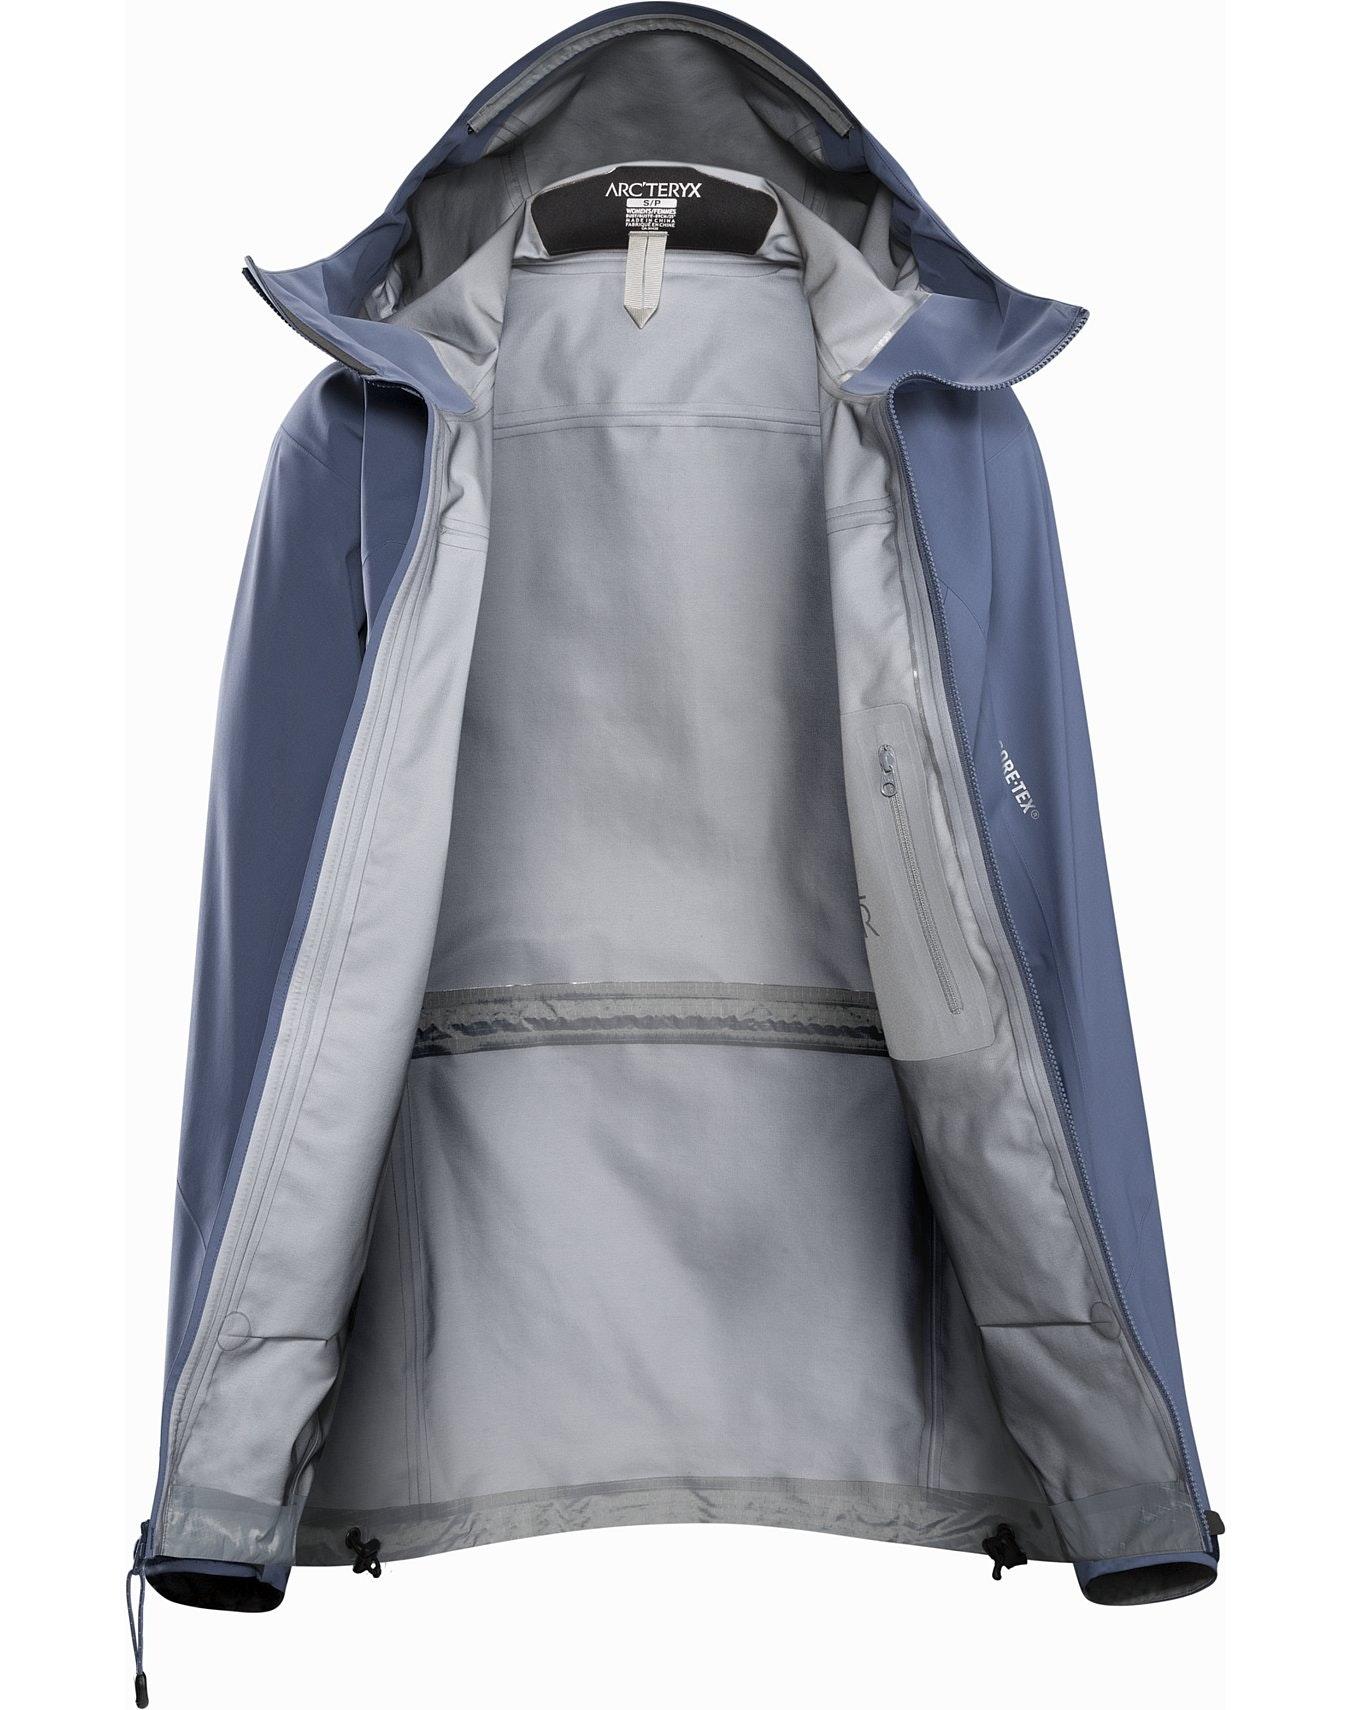 256cb613c425 dame Nightshadow Jacket AR Lillehammer Arc teryx sport Zeta w1qACAxO ...